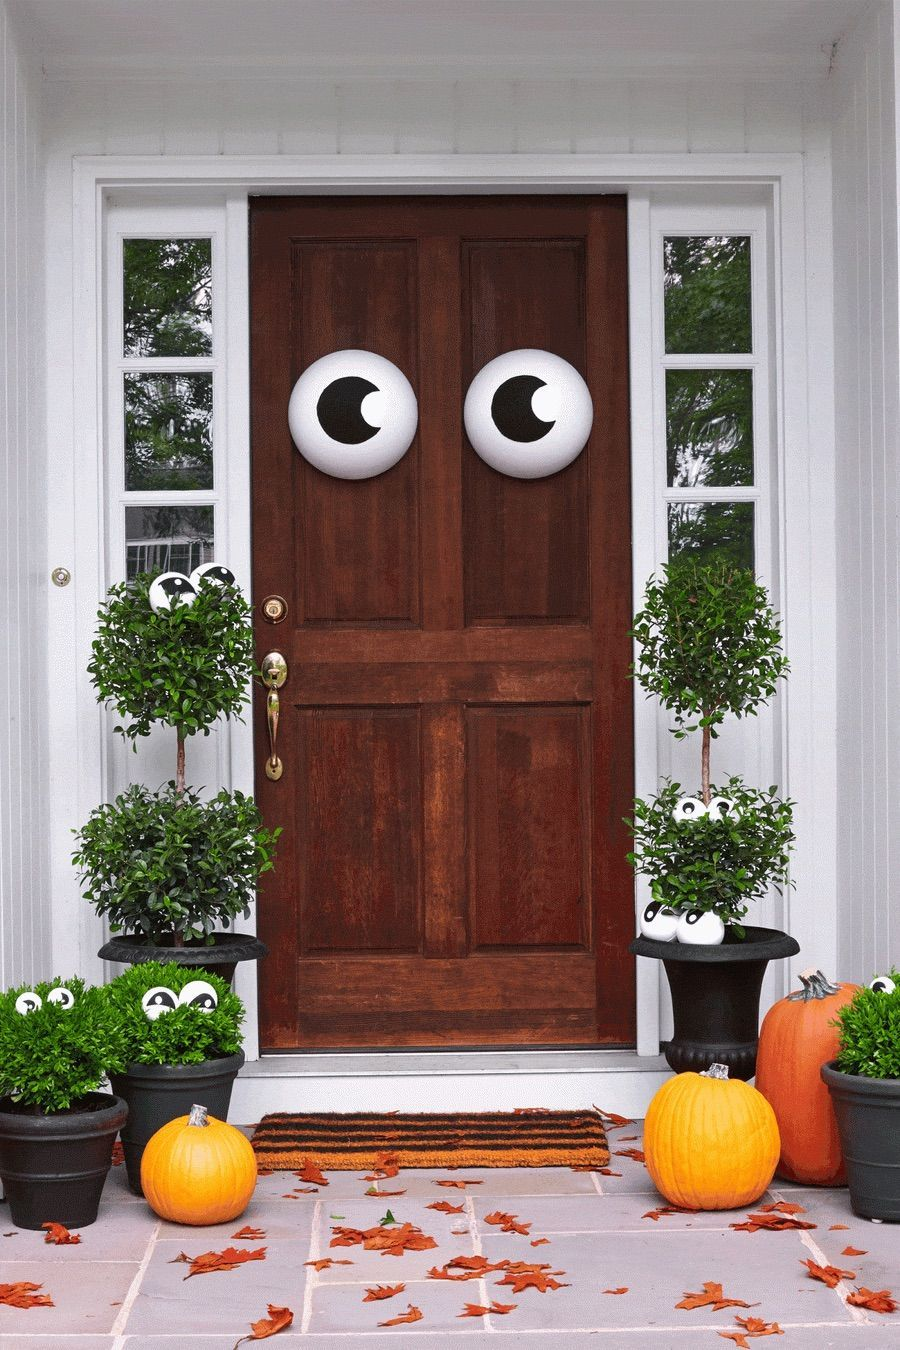 31 Halloween Front Porch Decor Ideas